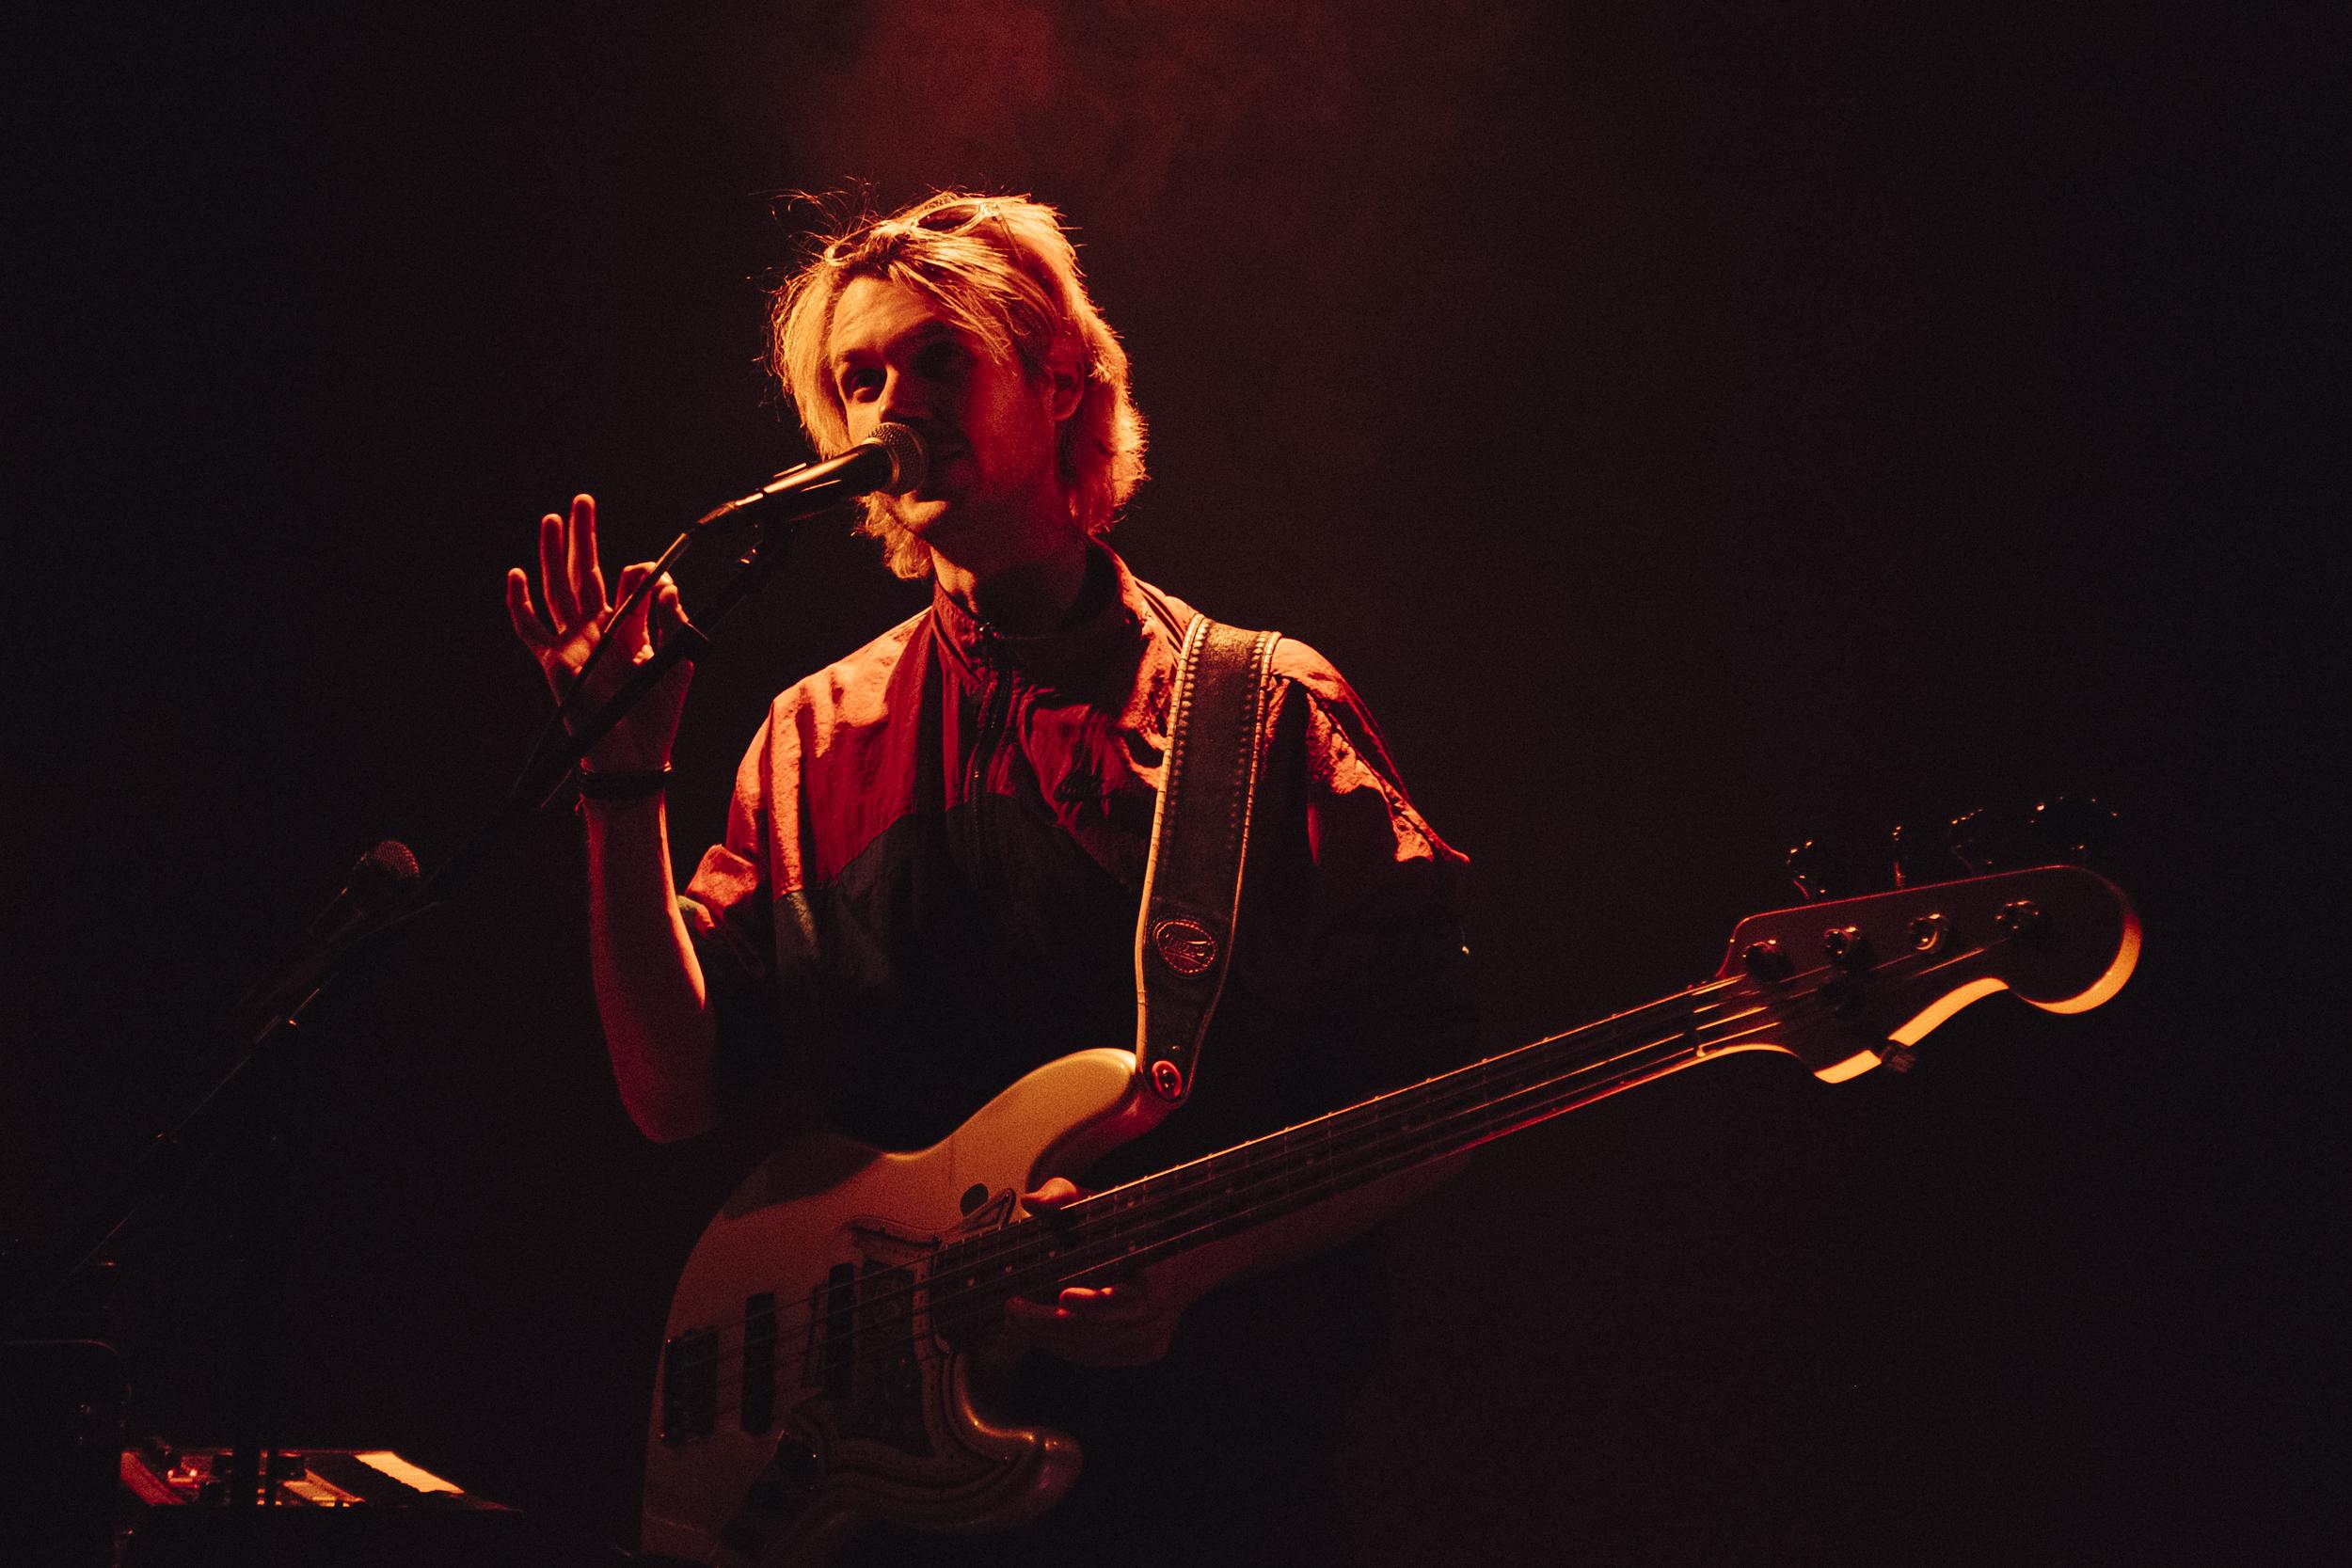 Nick Furrer a.k.a. Haubi Songs mit Bassgitarre.